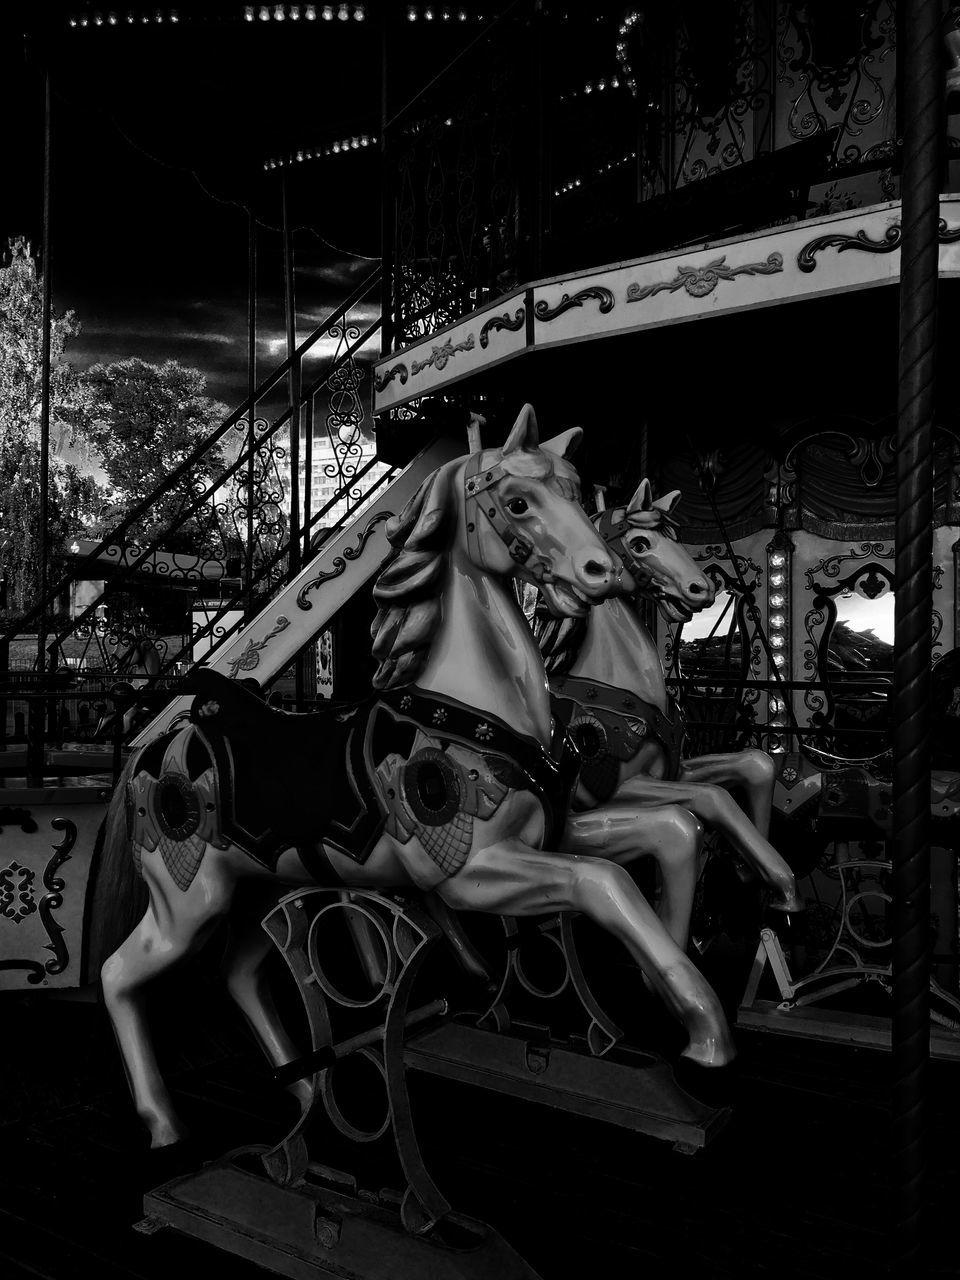 amusement park, carousel horses, amusement park ride, animal representation, horse, carousel, arts culture and entertainment, night, no people, animal themes, outdoors